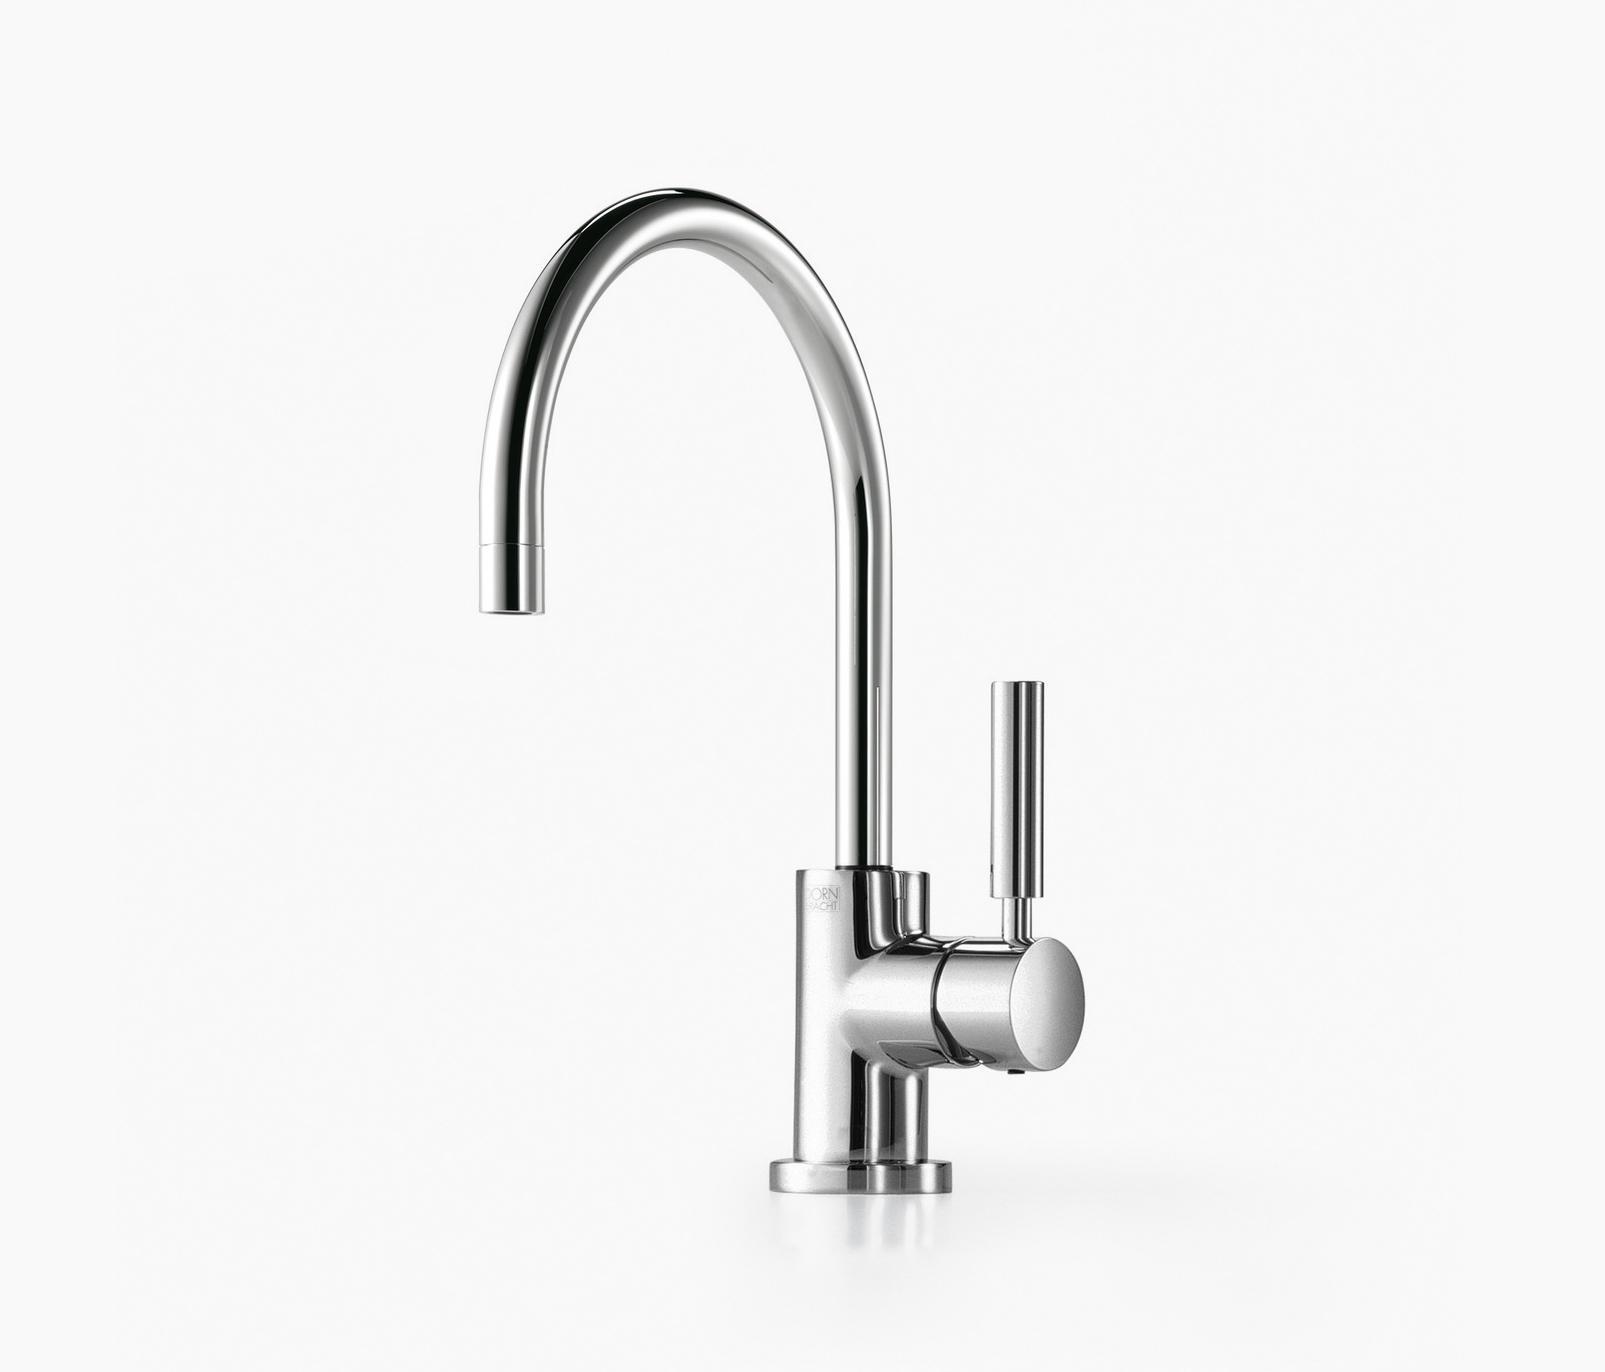 dornbracht kitchen faucets small island tara classic besto blog